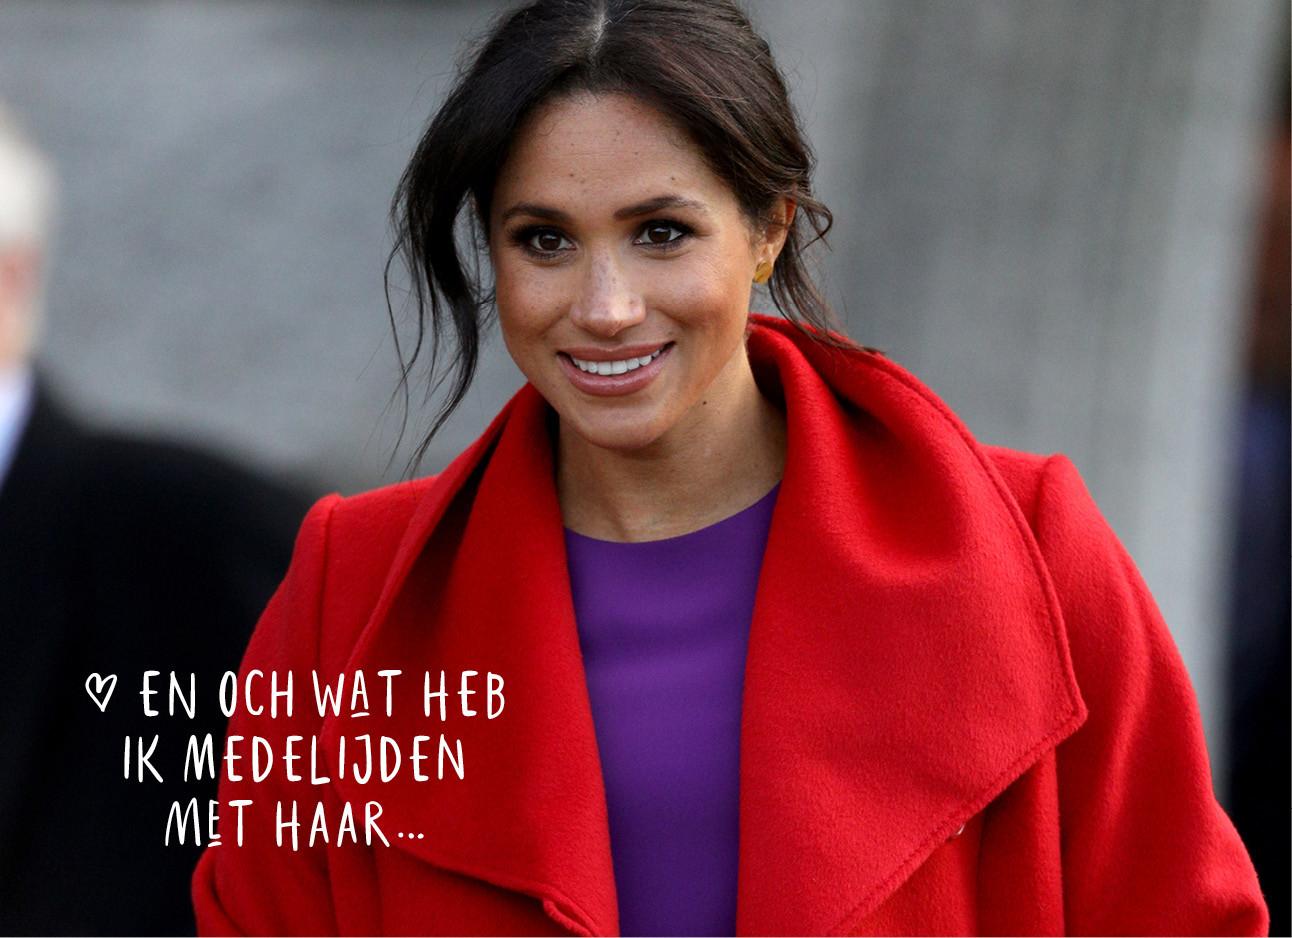 Meghan markle in paarse jurk en rode jas